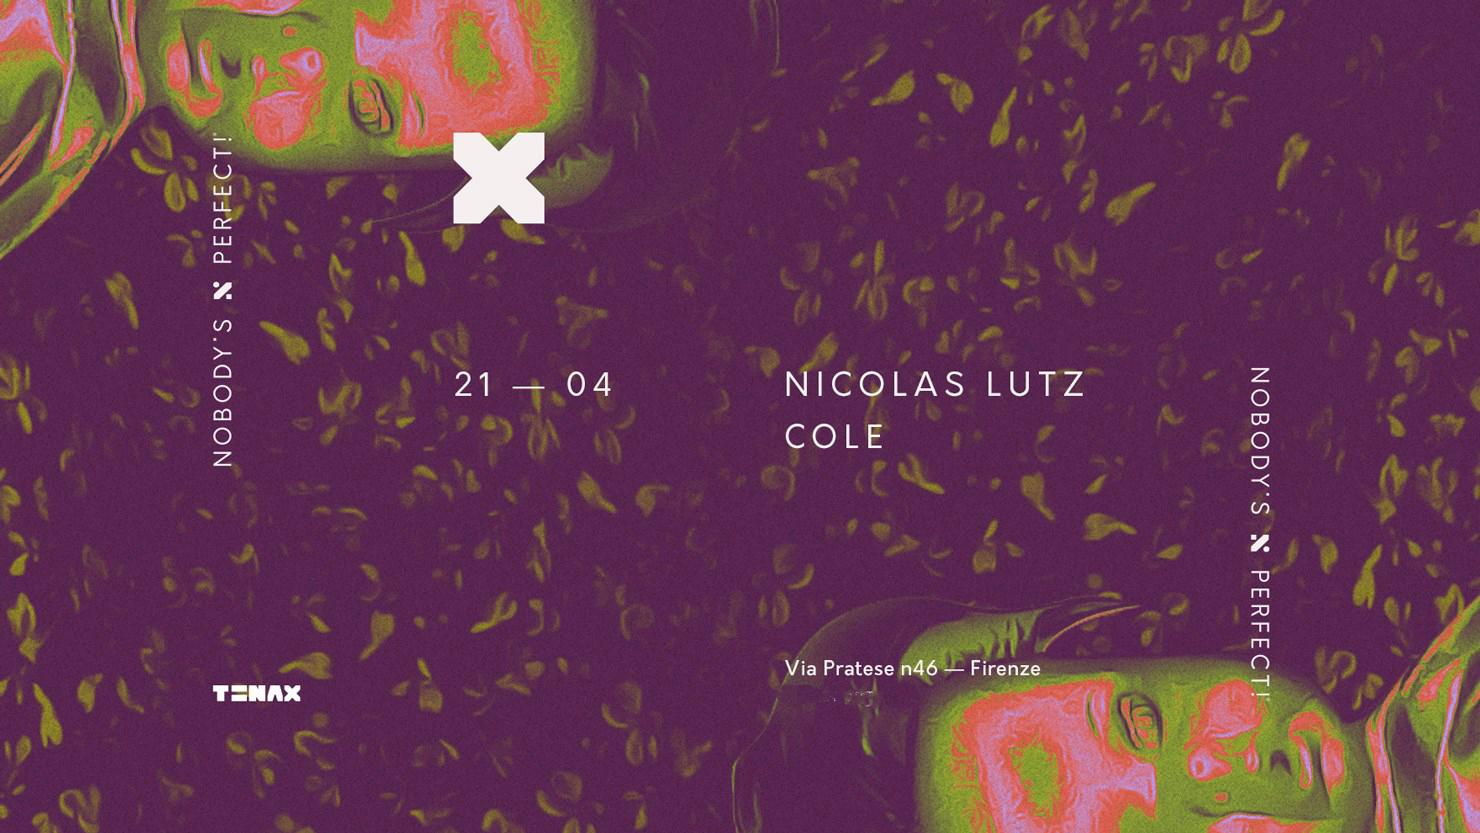 Tenax Firenze Nicolas Lutz – Sabato 21 Aprile 2018